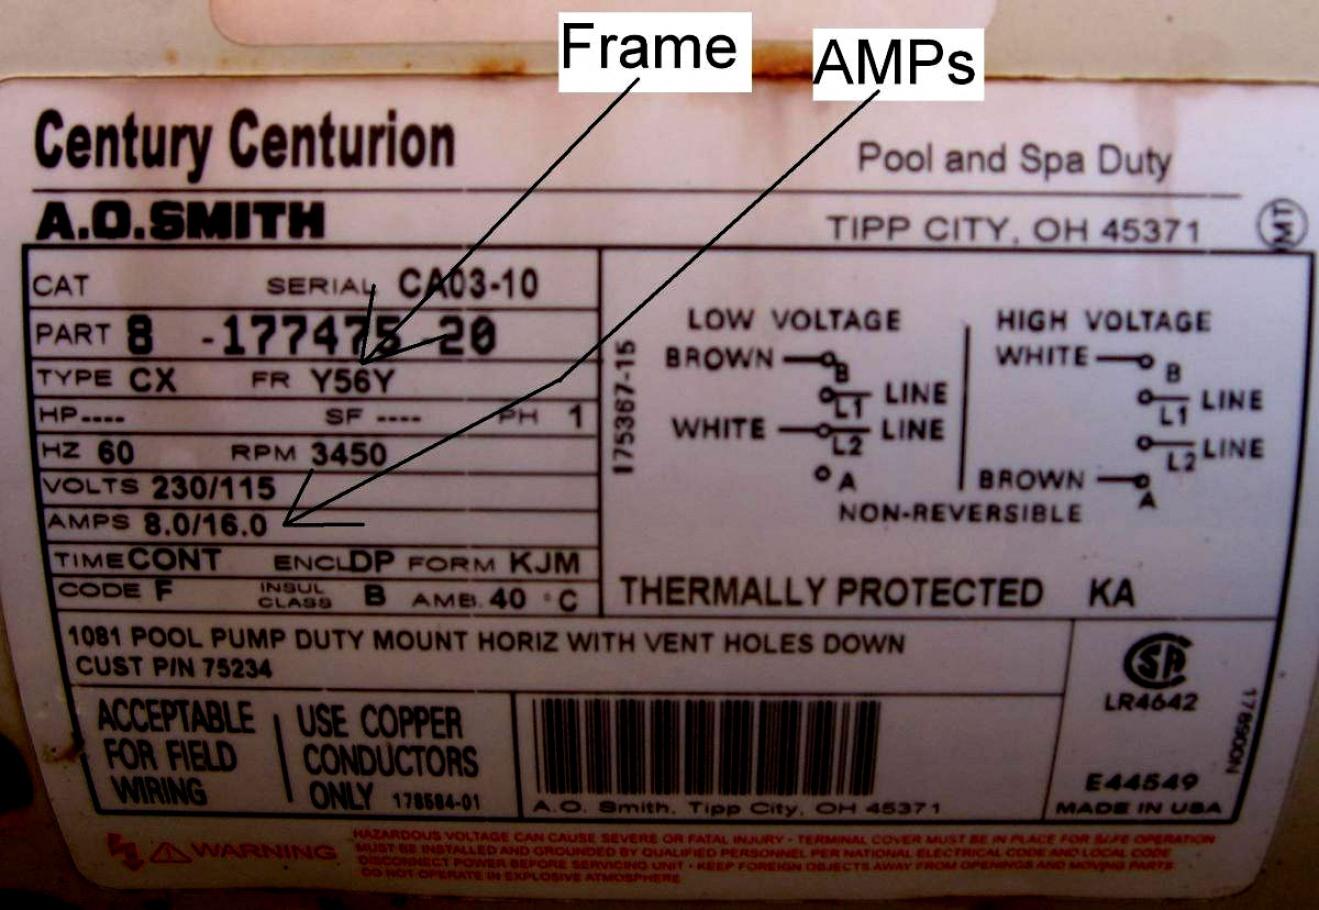 [SCHEMATICS_4CA]  SV_0050] Wiring Diagram For 115 230 Motor With Numbered Wiring Free Diagram | 115 Volt Ac Motor Wiring |  | Odga Unbe Gresi Skat Salv Mohammedshrine Librar Wiring 101